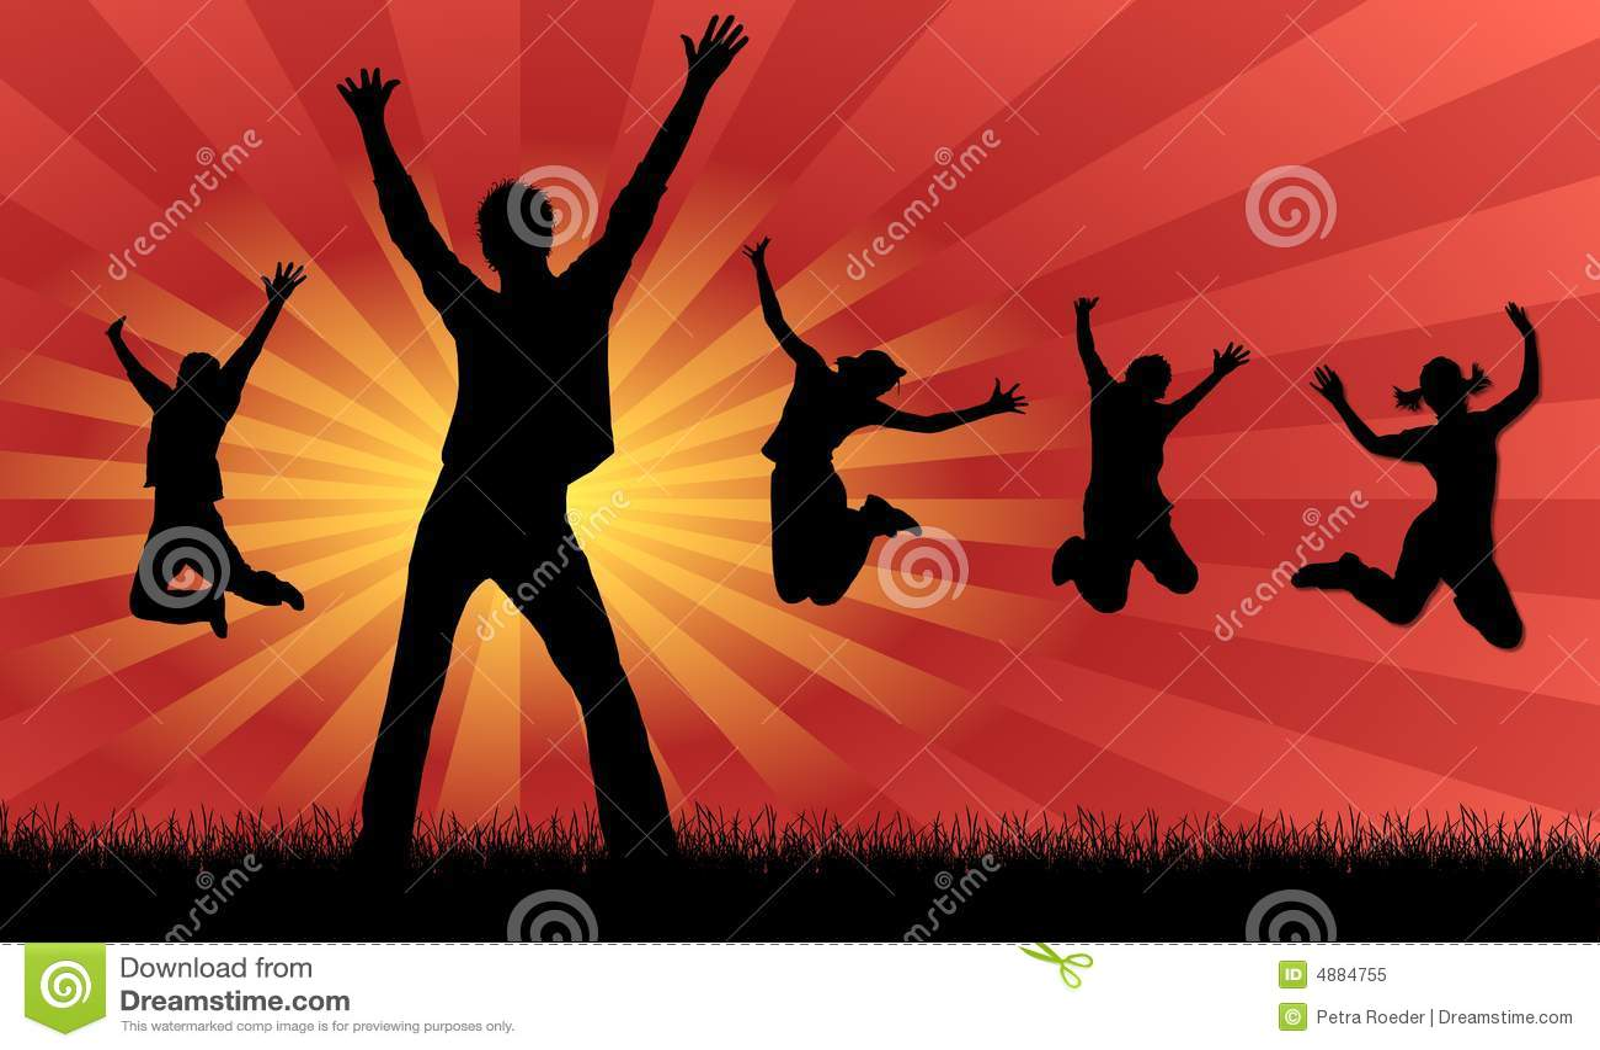 jumping for joy royalty free stock photo image 4884755